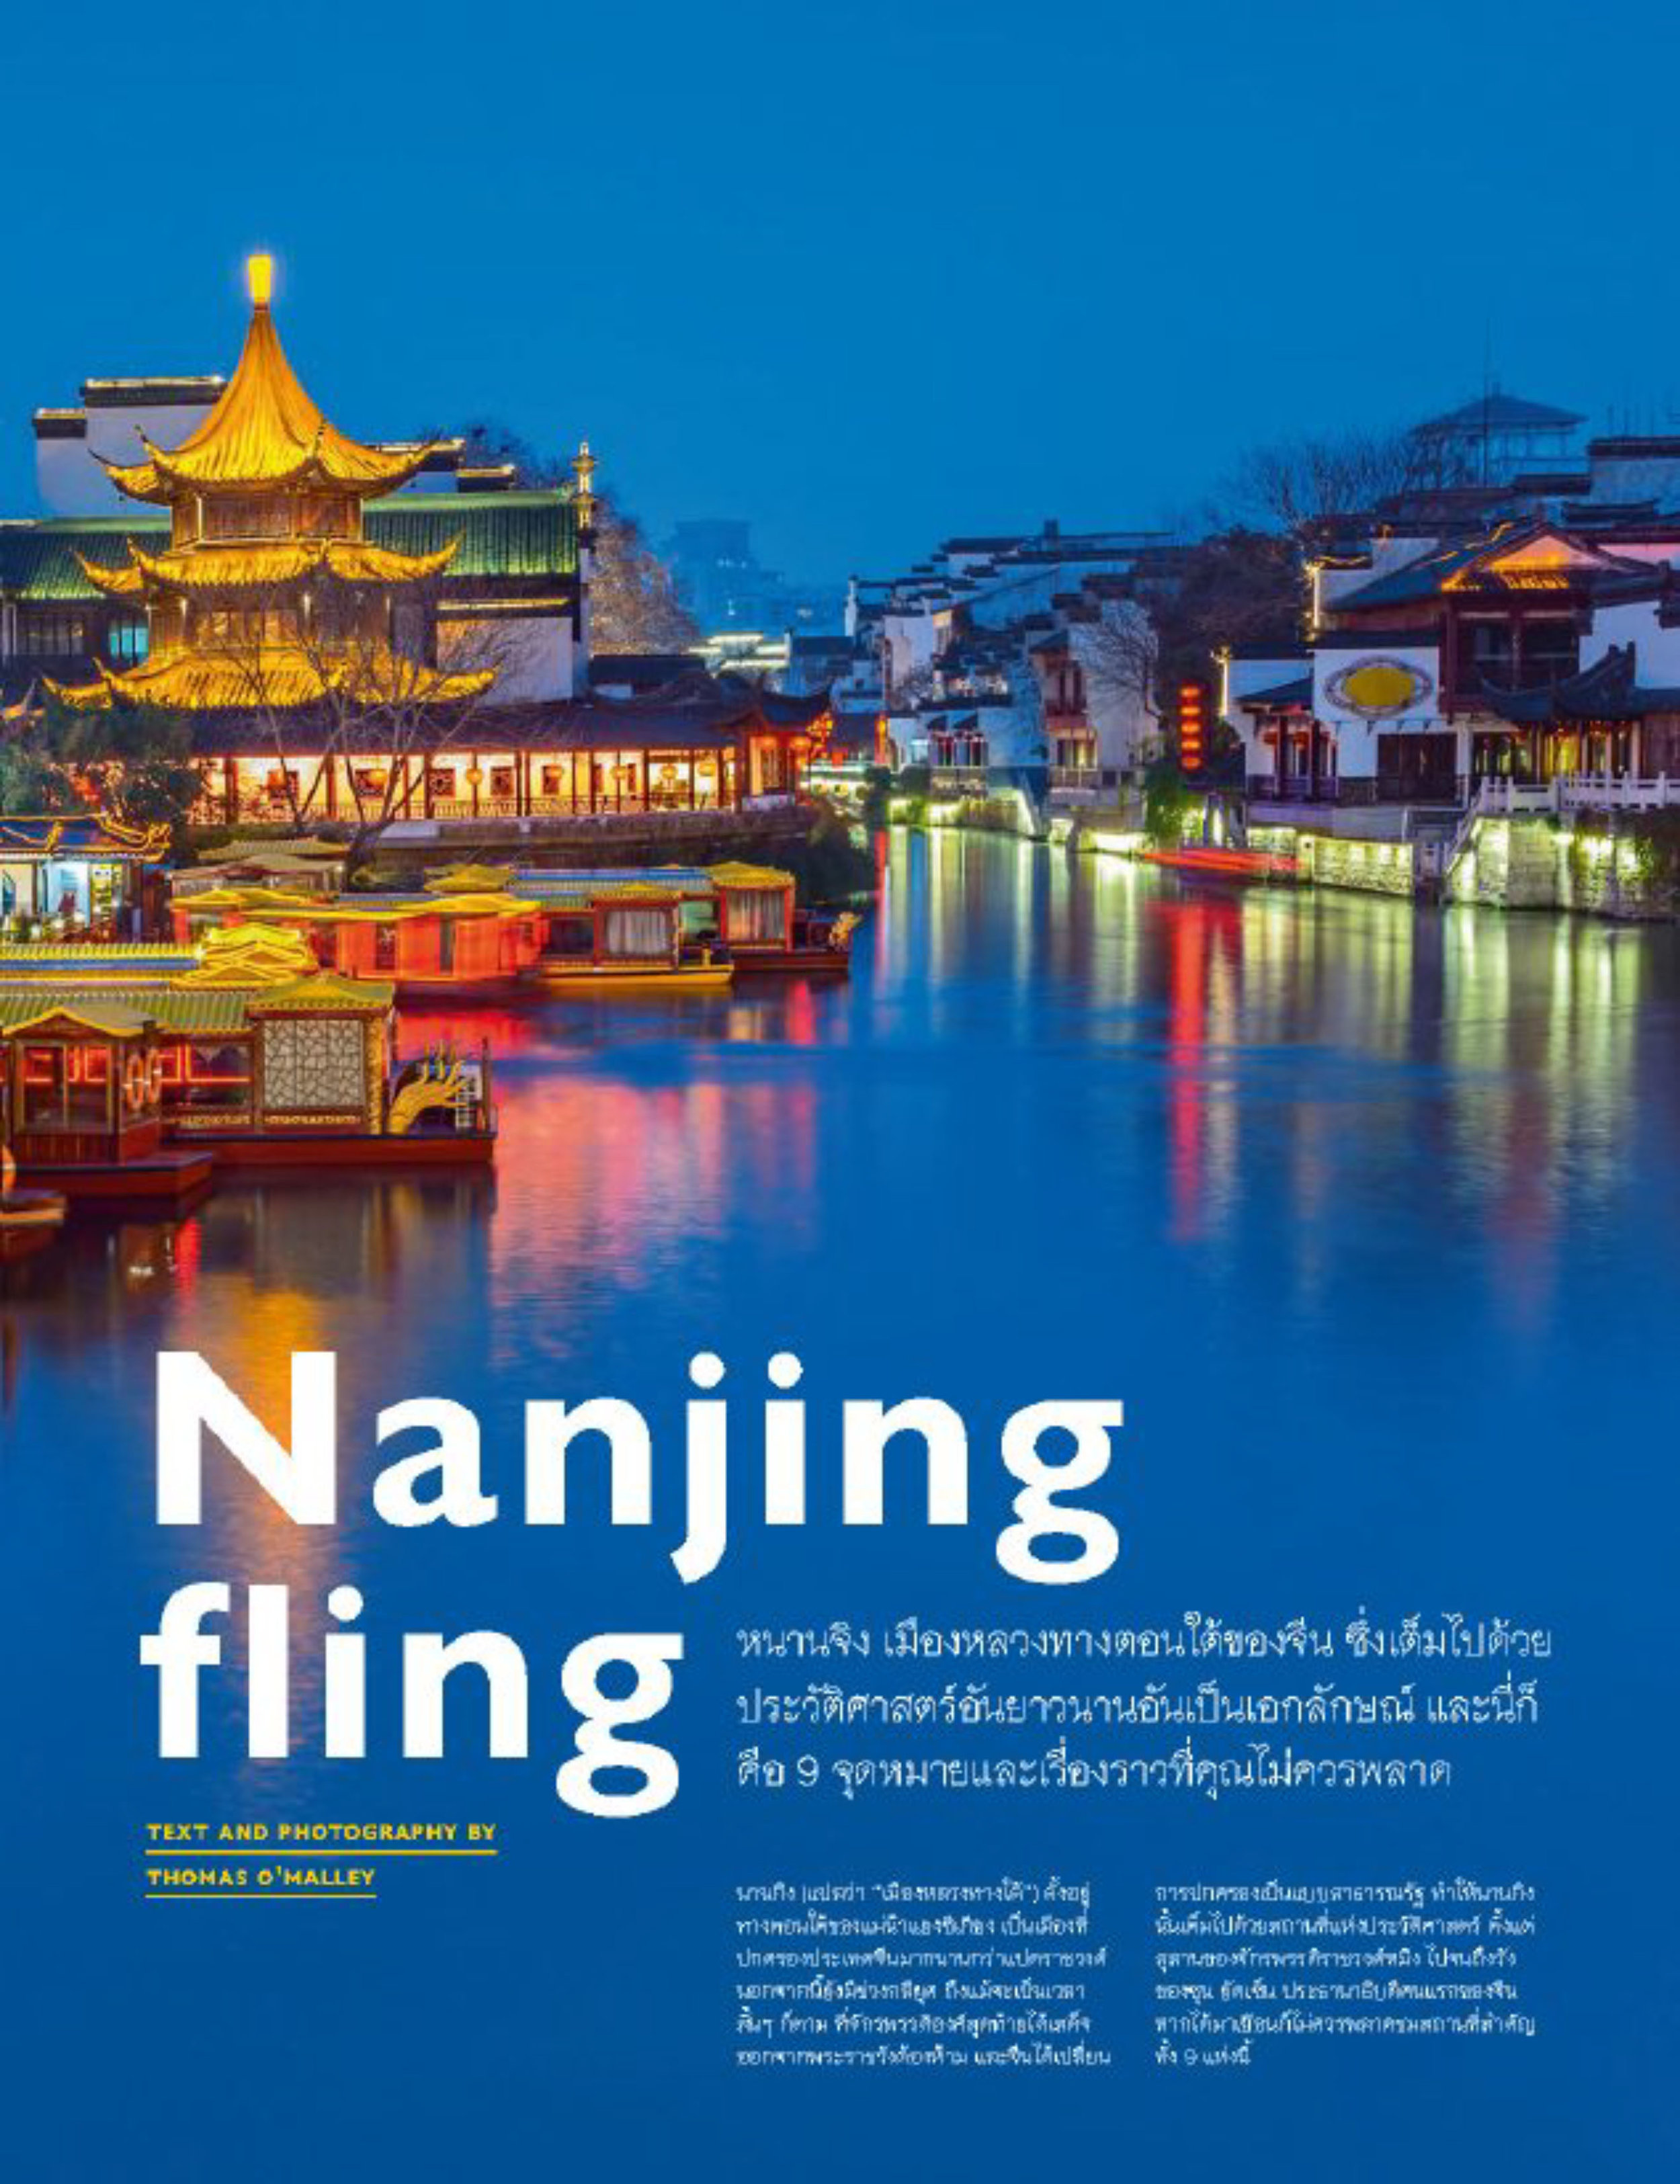 Scoot Nanjing article-2.jpg